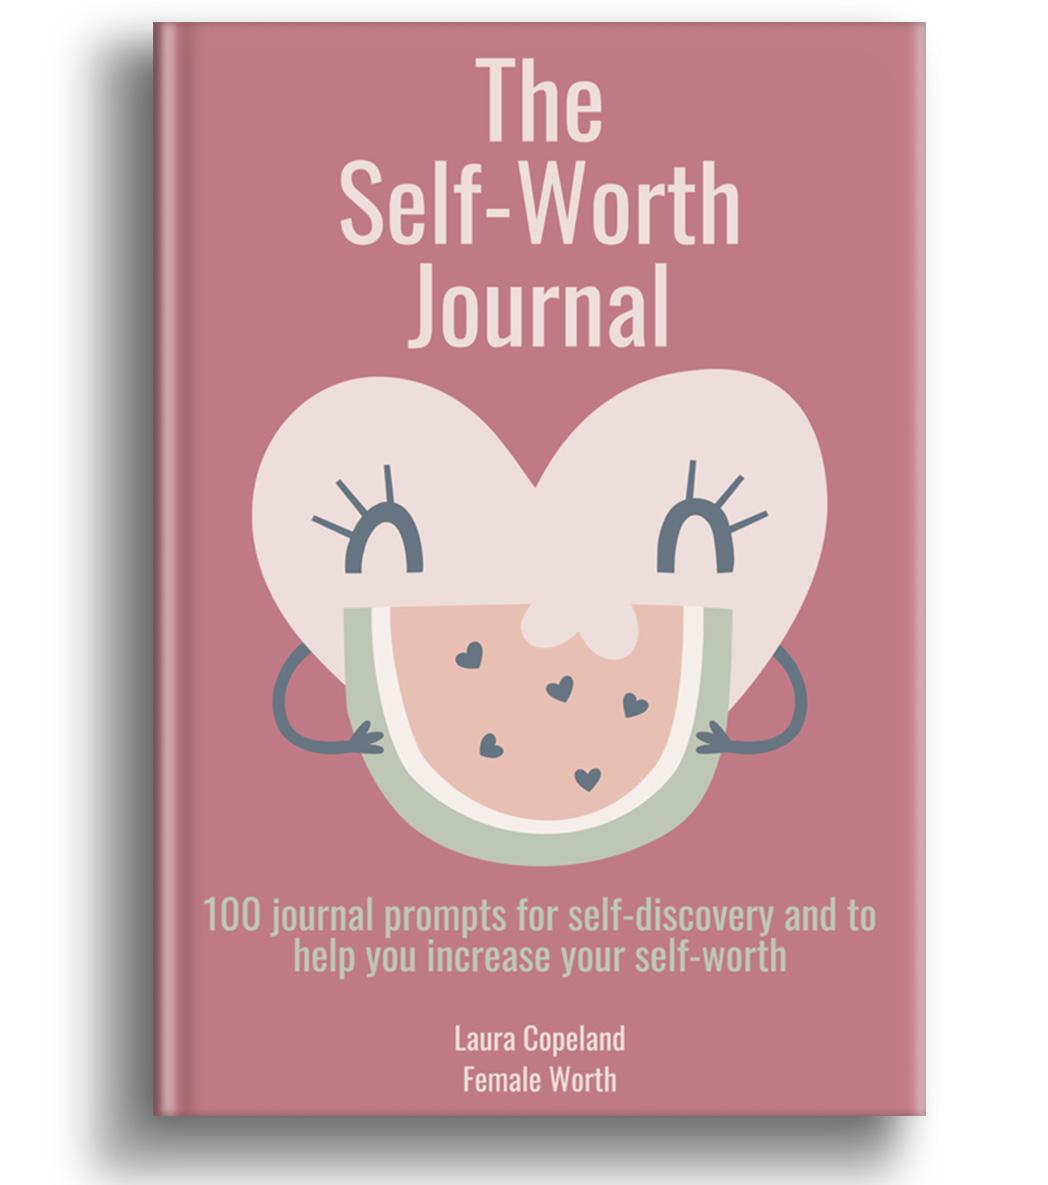 The Self-Worth Journal